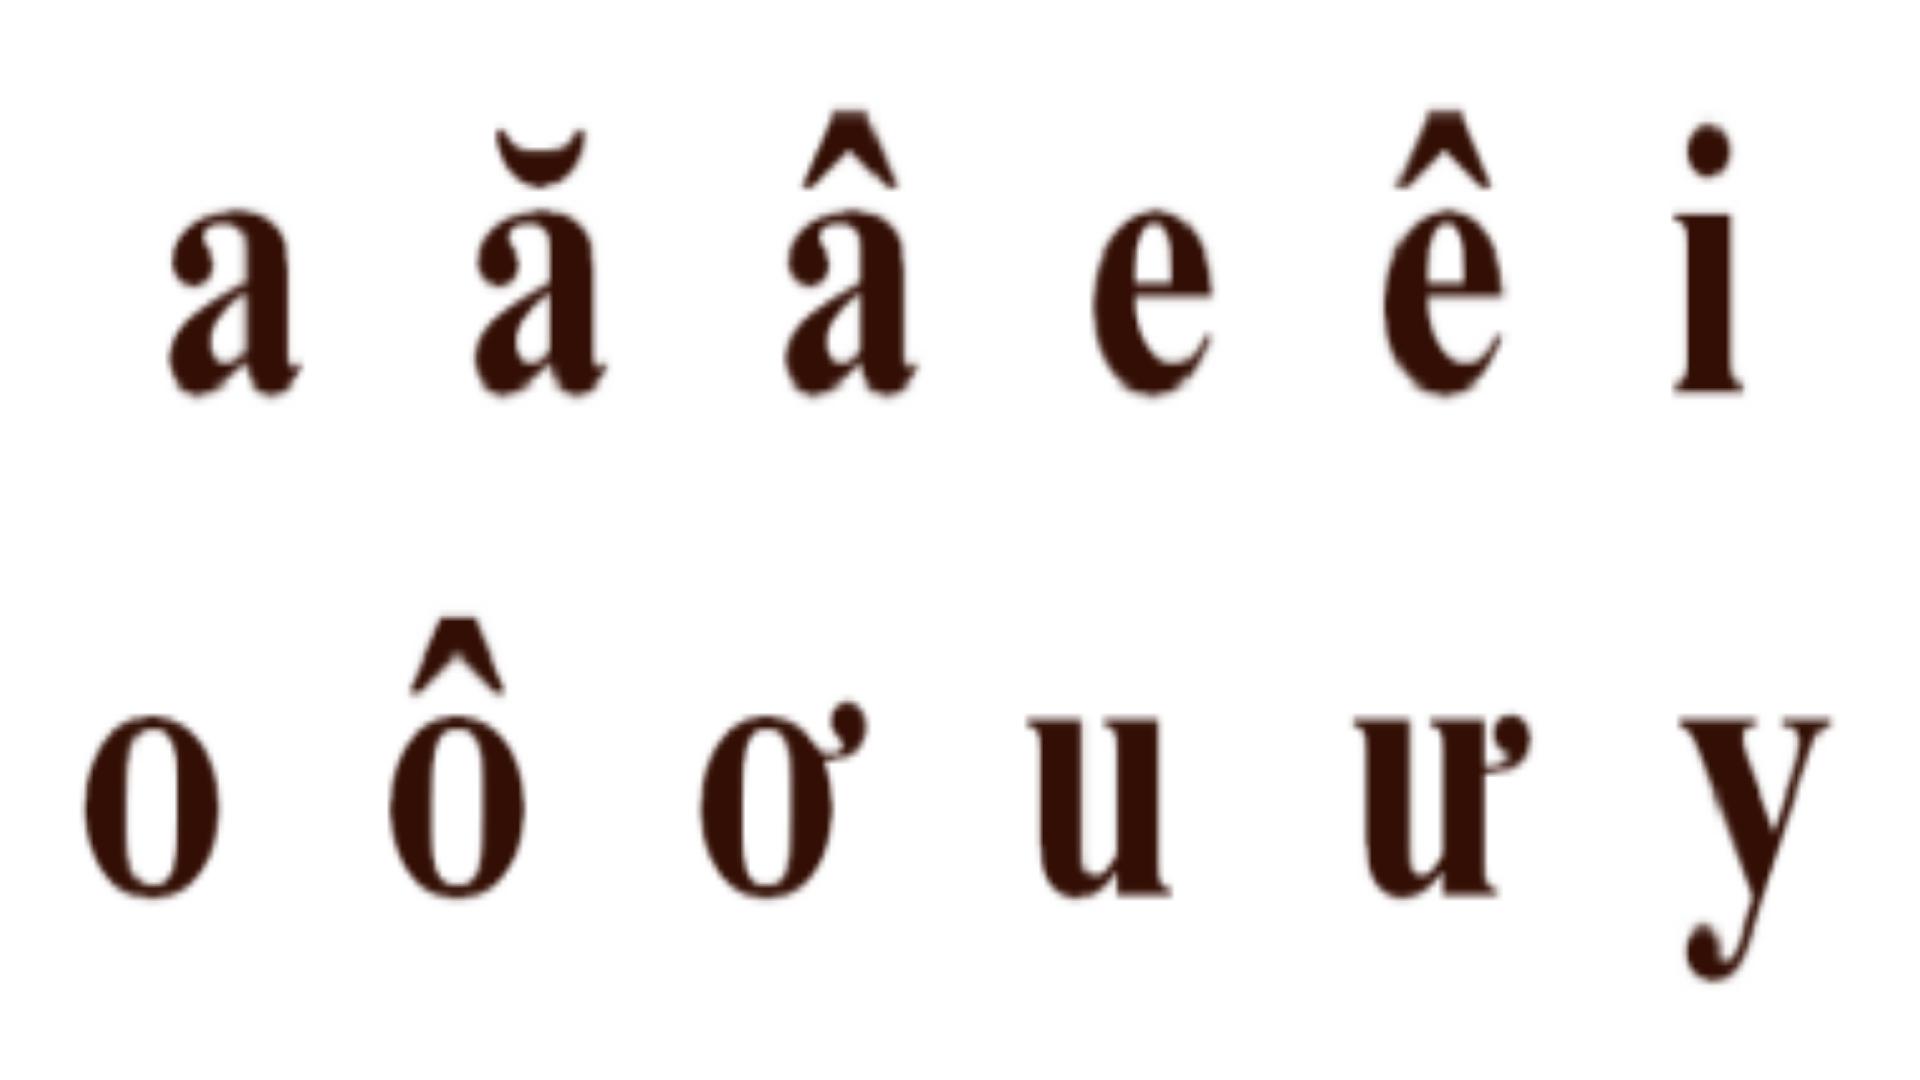 12-nguyen-am-don-e14515200804592-1920x1080